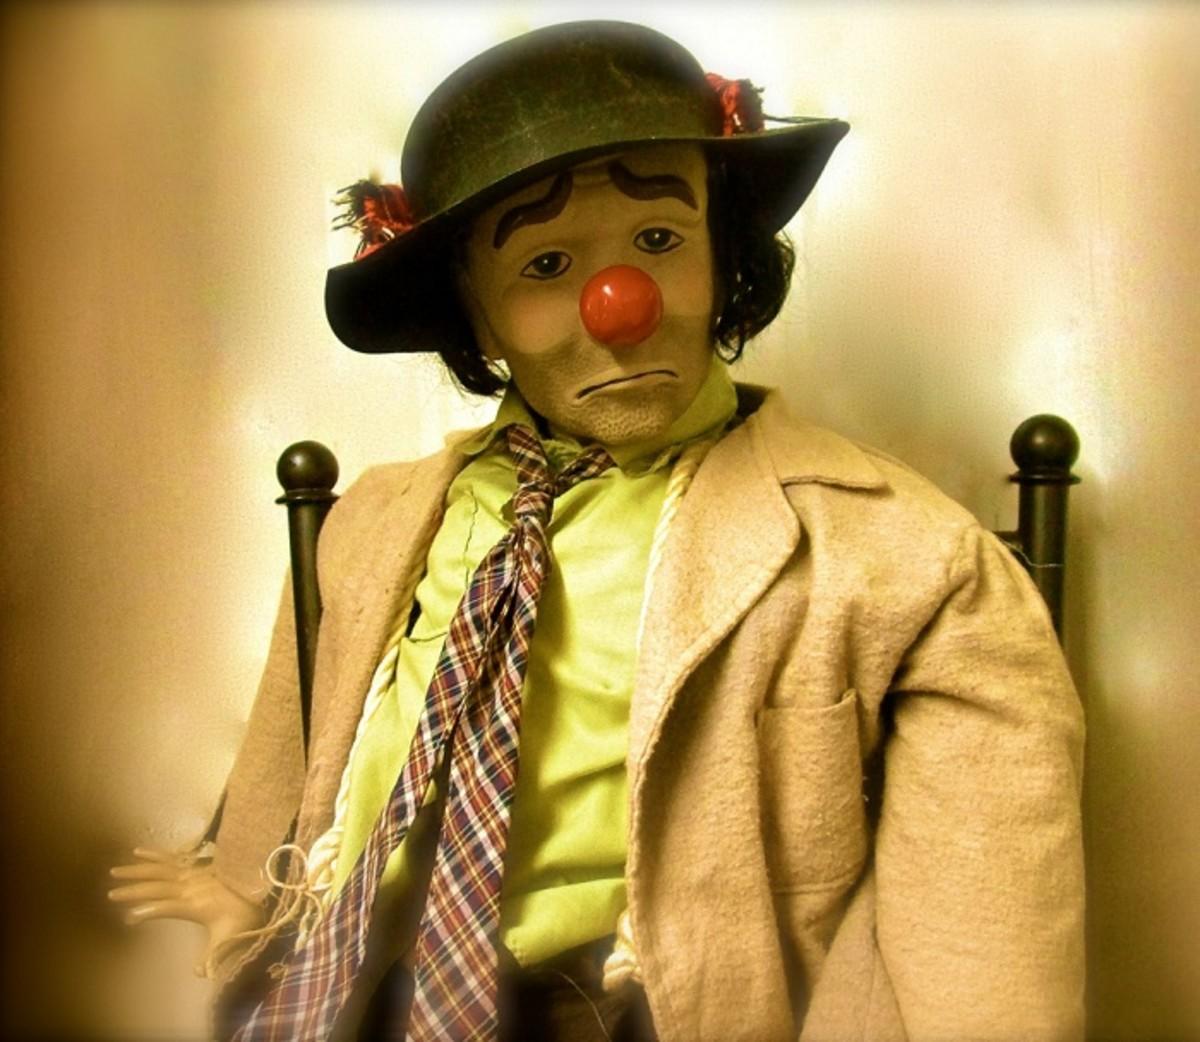 Emmett Kelly - Weary Willie Sad Clown Collectible Dolls